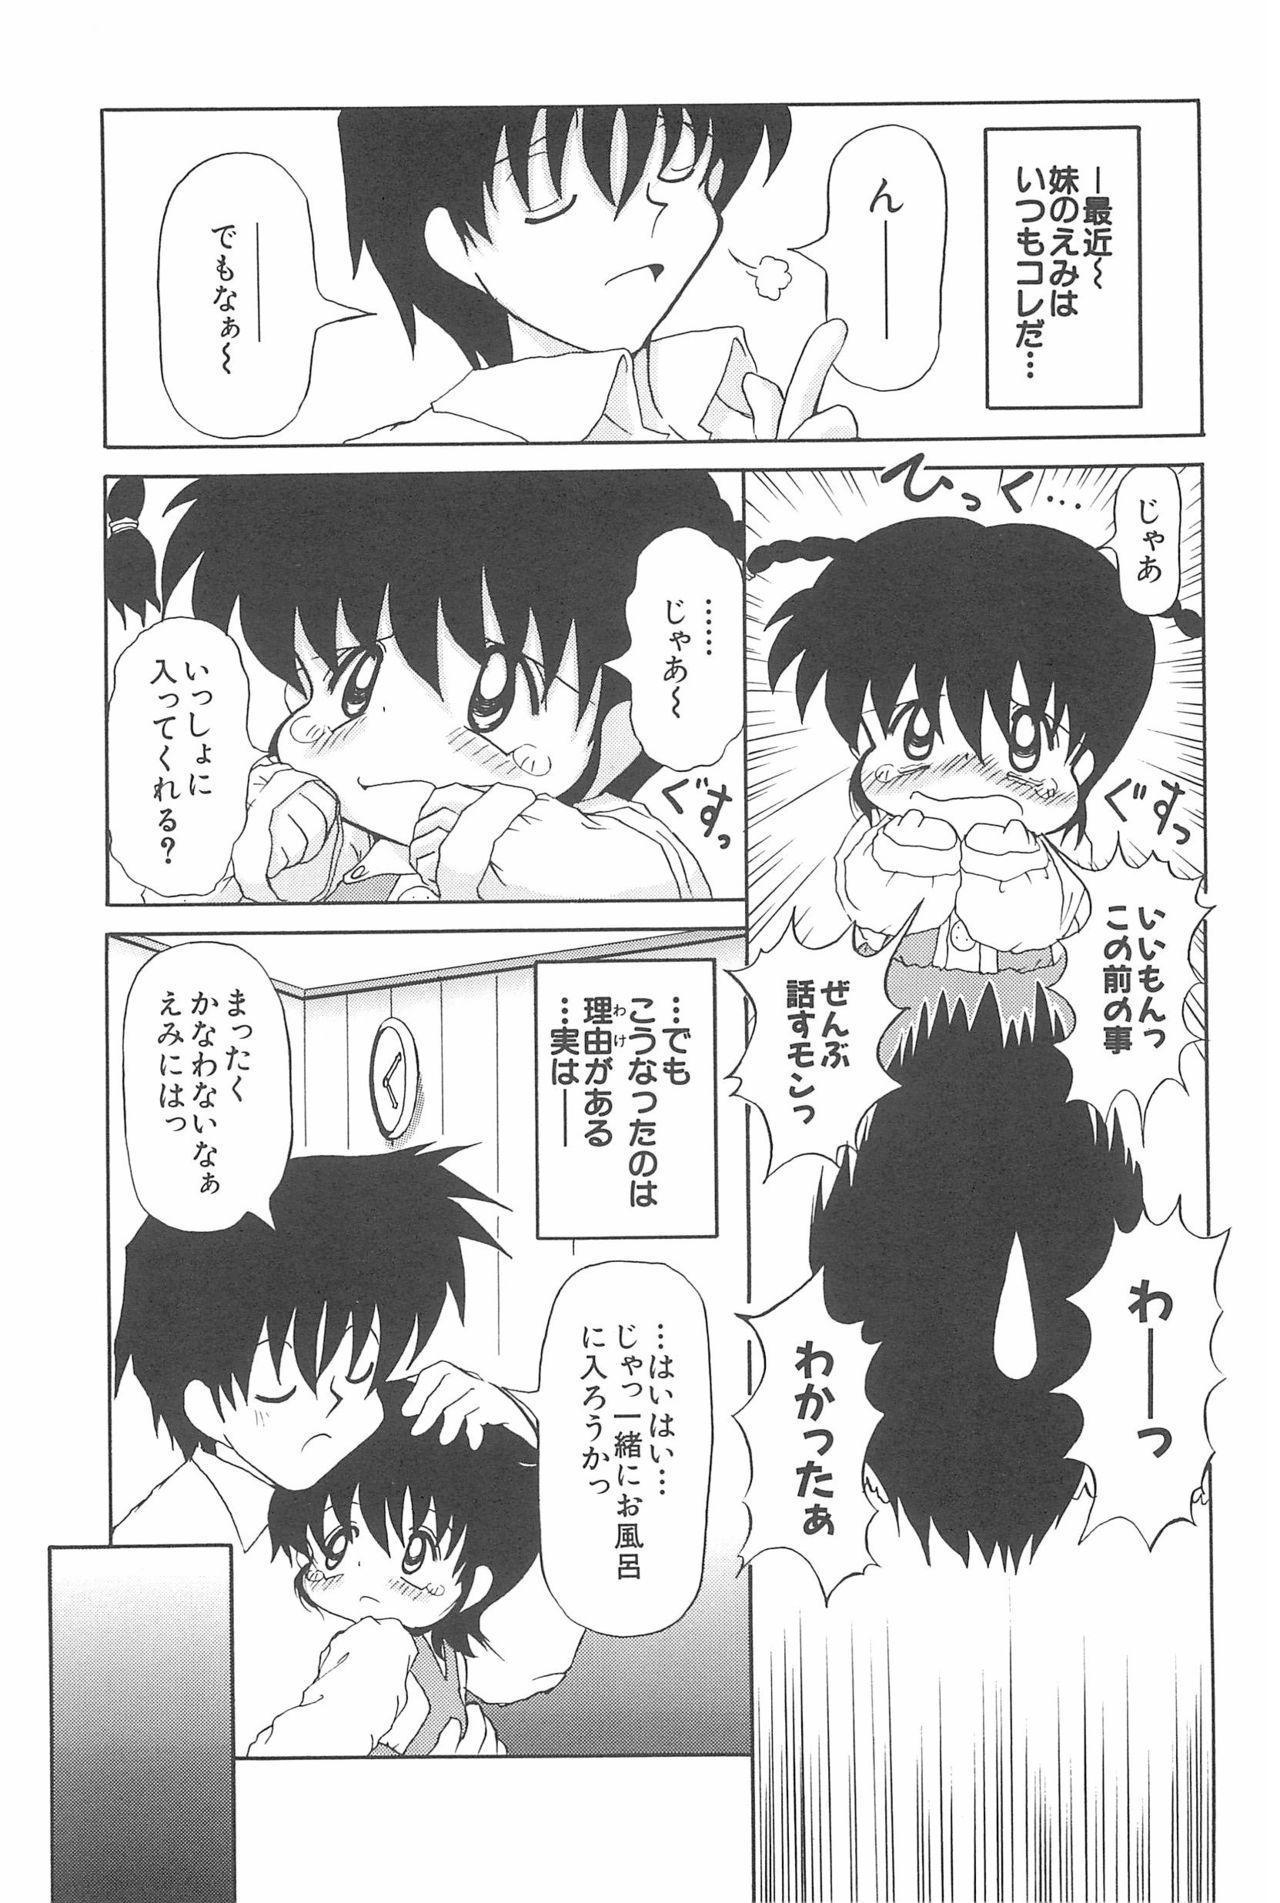 Aoi Shojokyuu 112